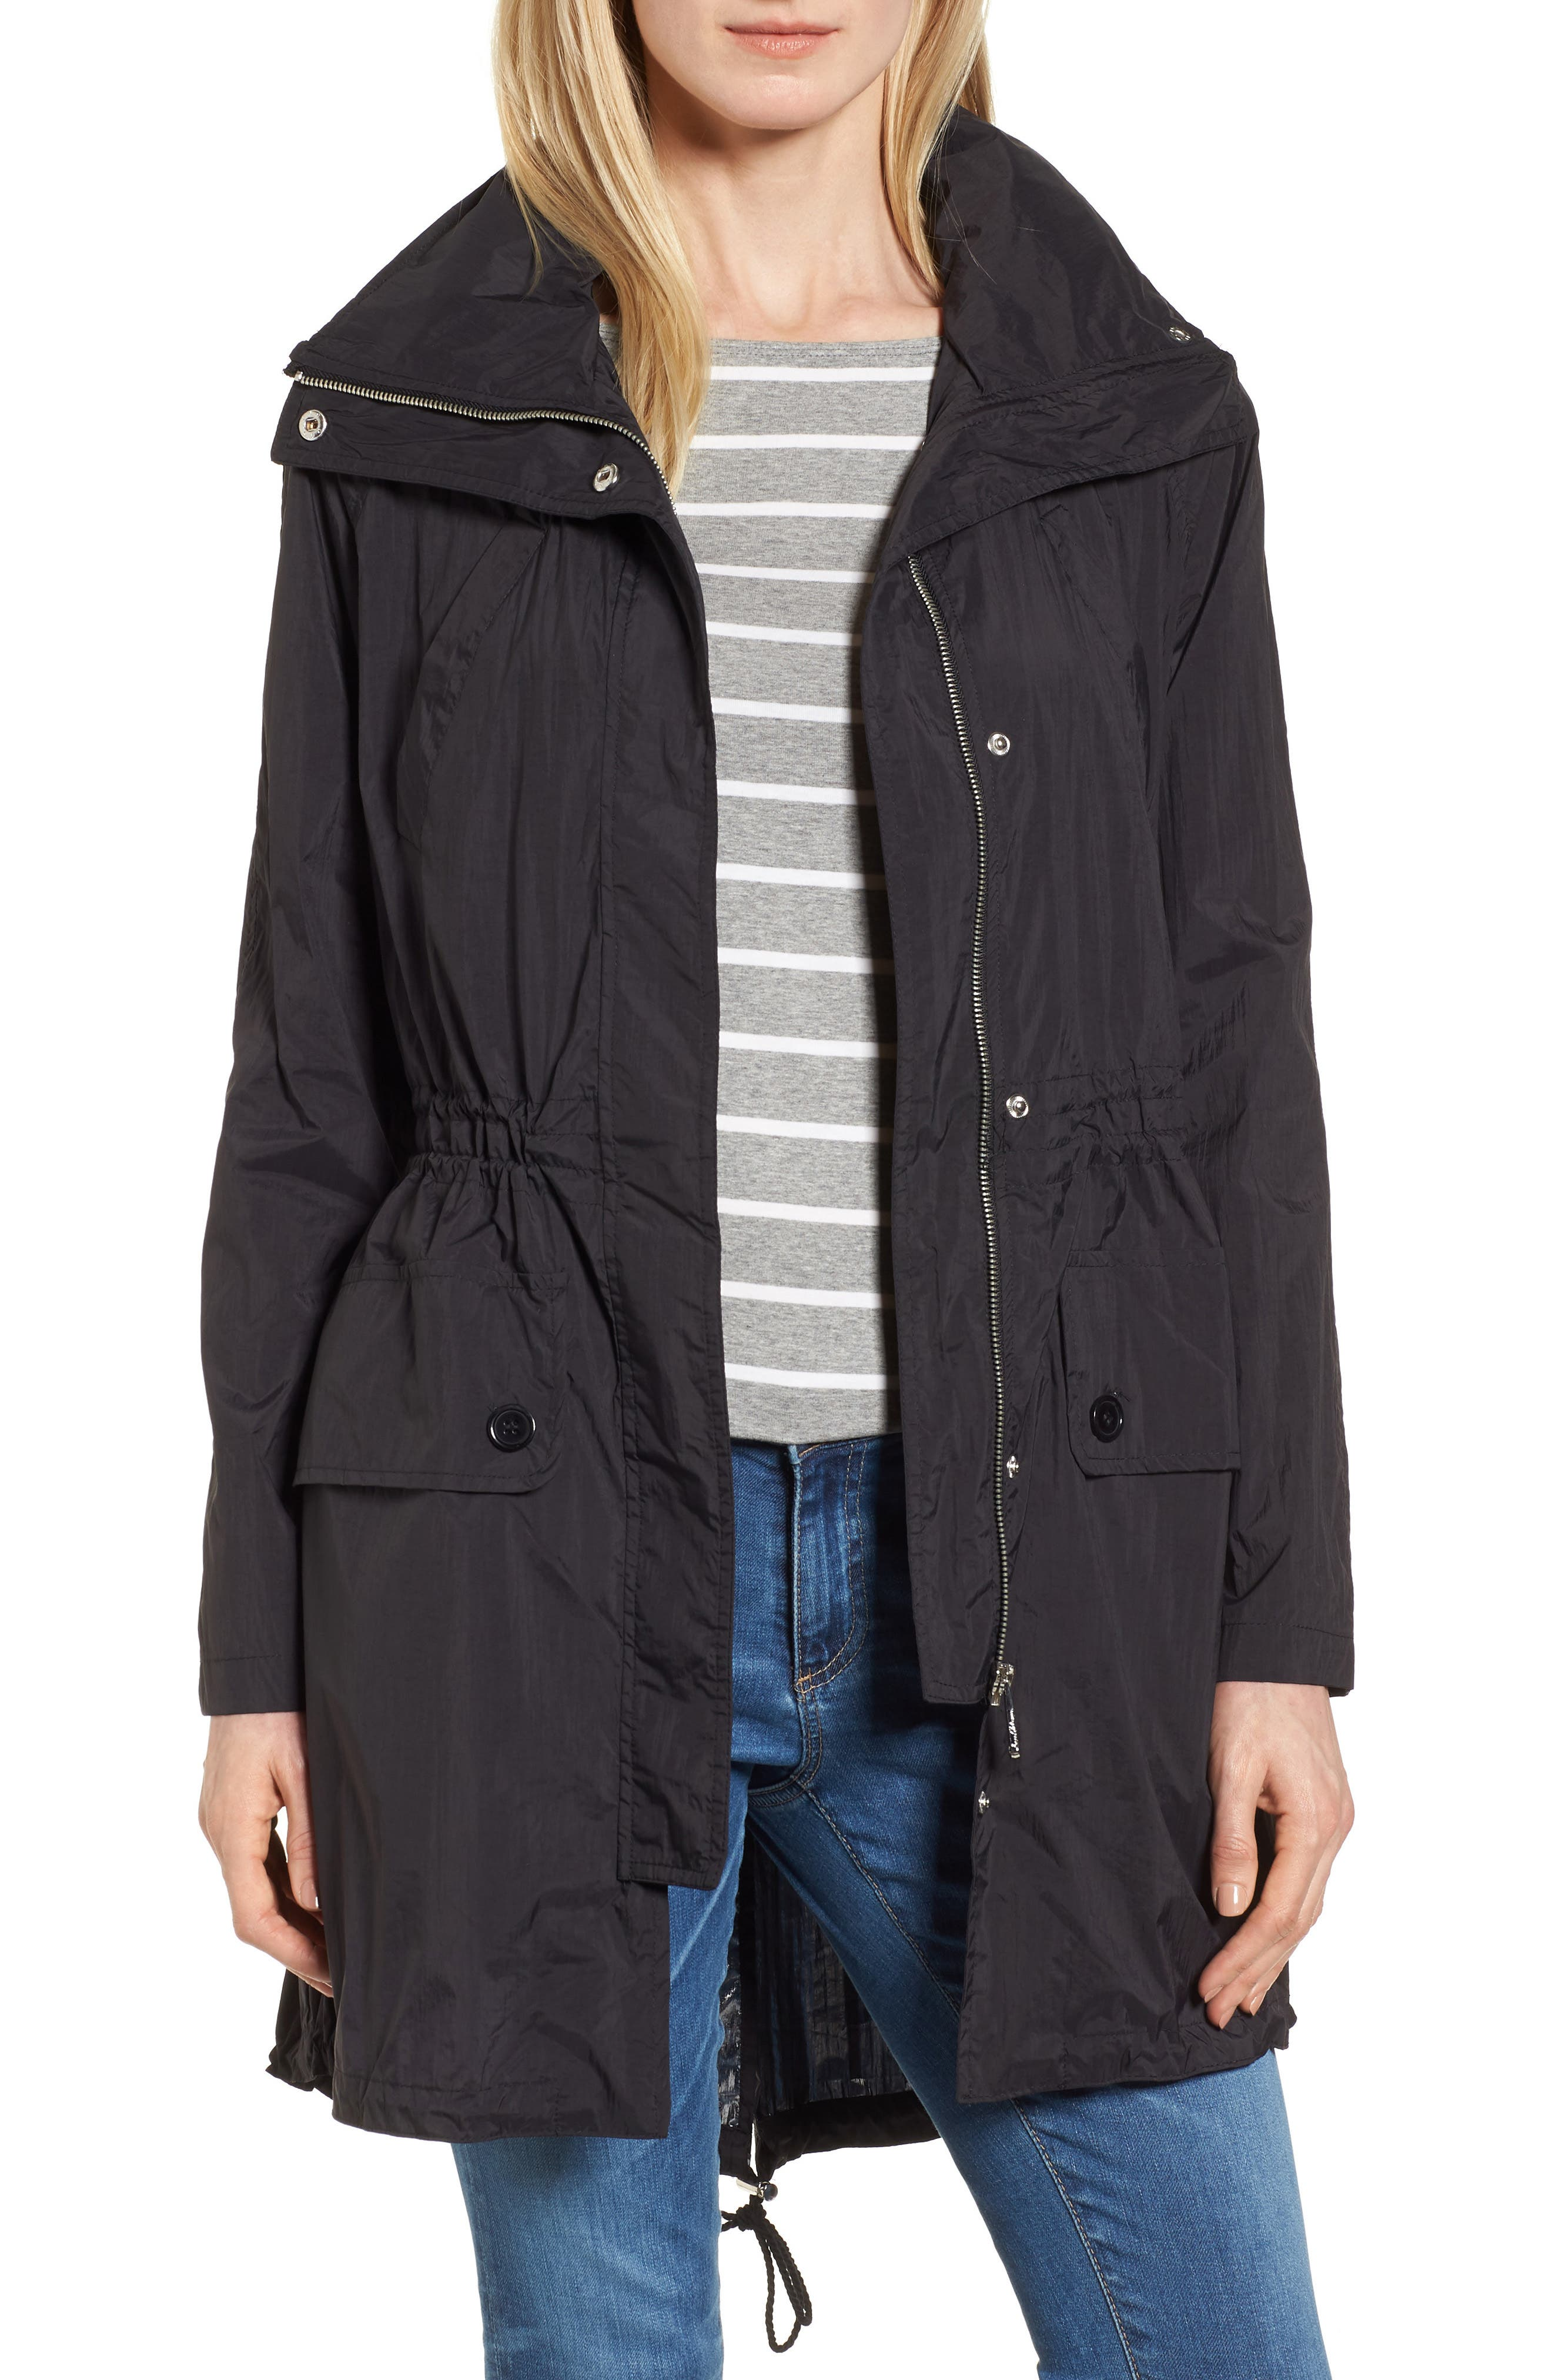 Alternate Image 1 Selected - Sam Edelman Crinkle Anorak Jacket